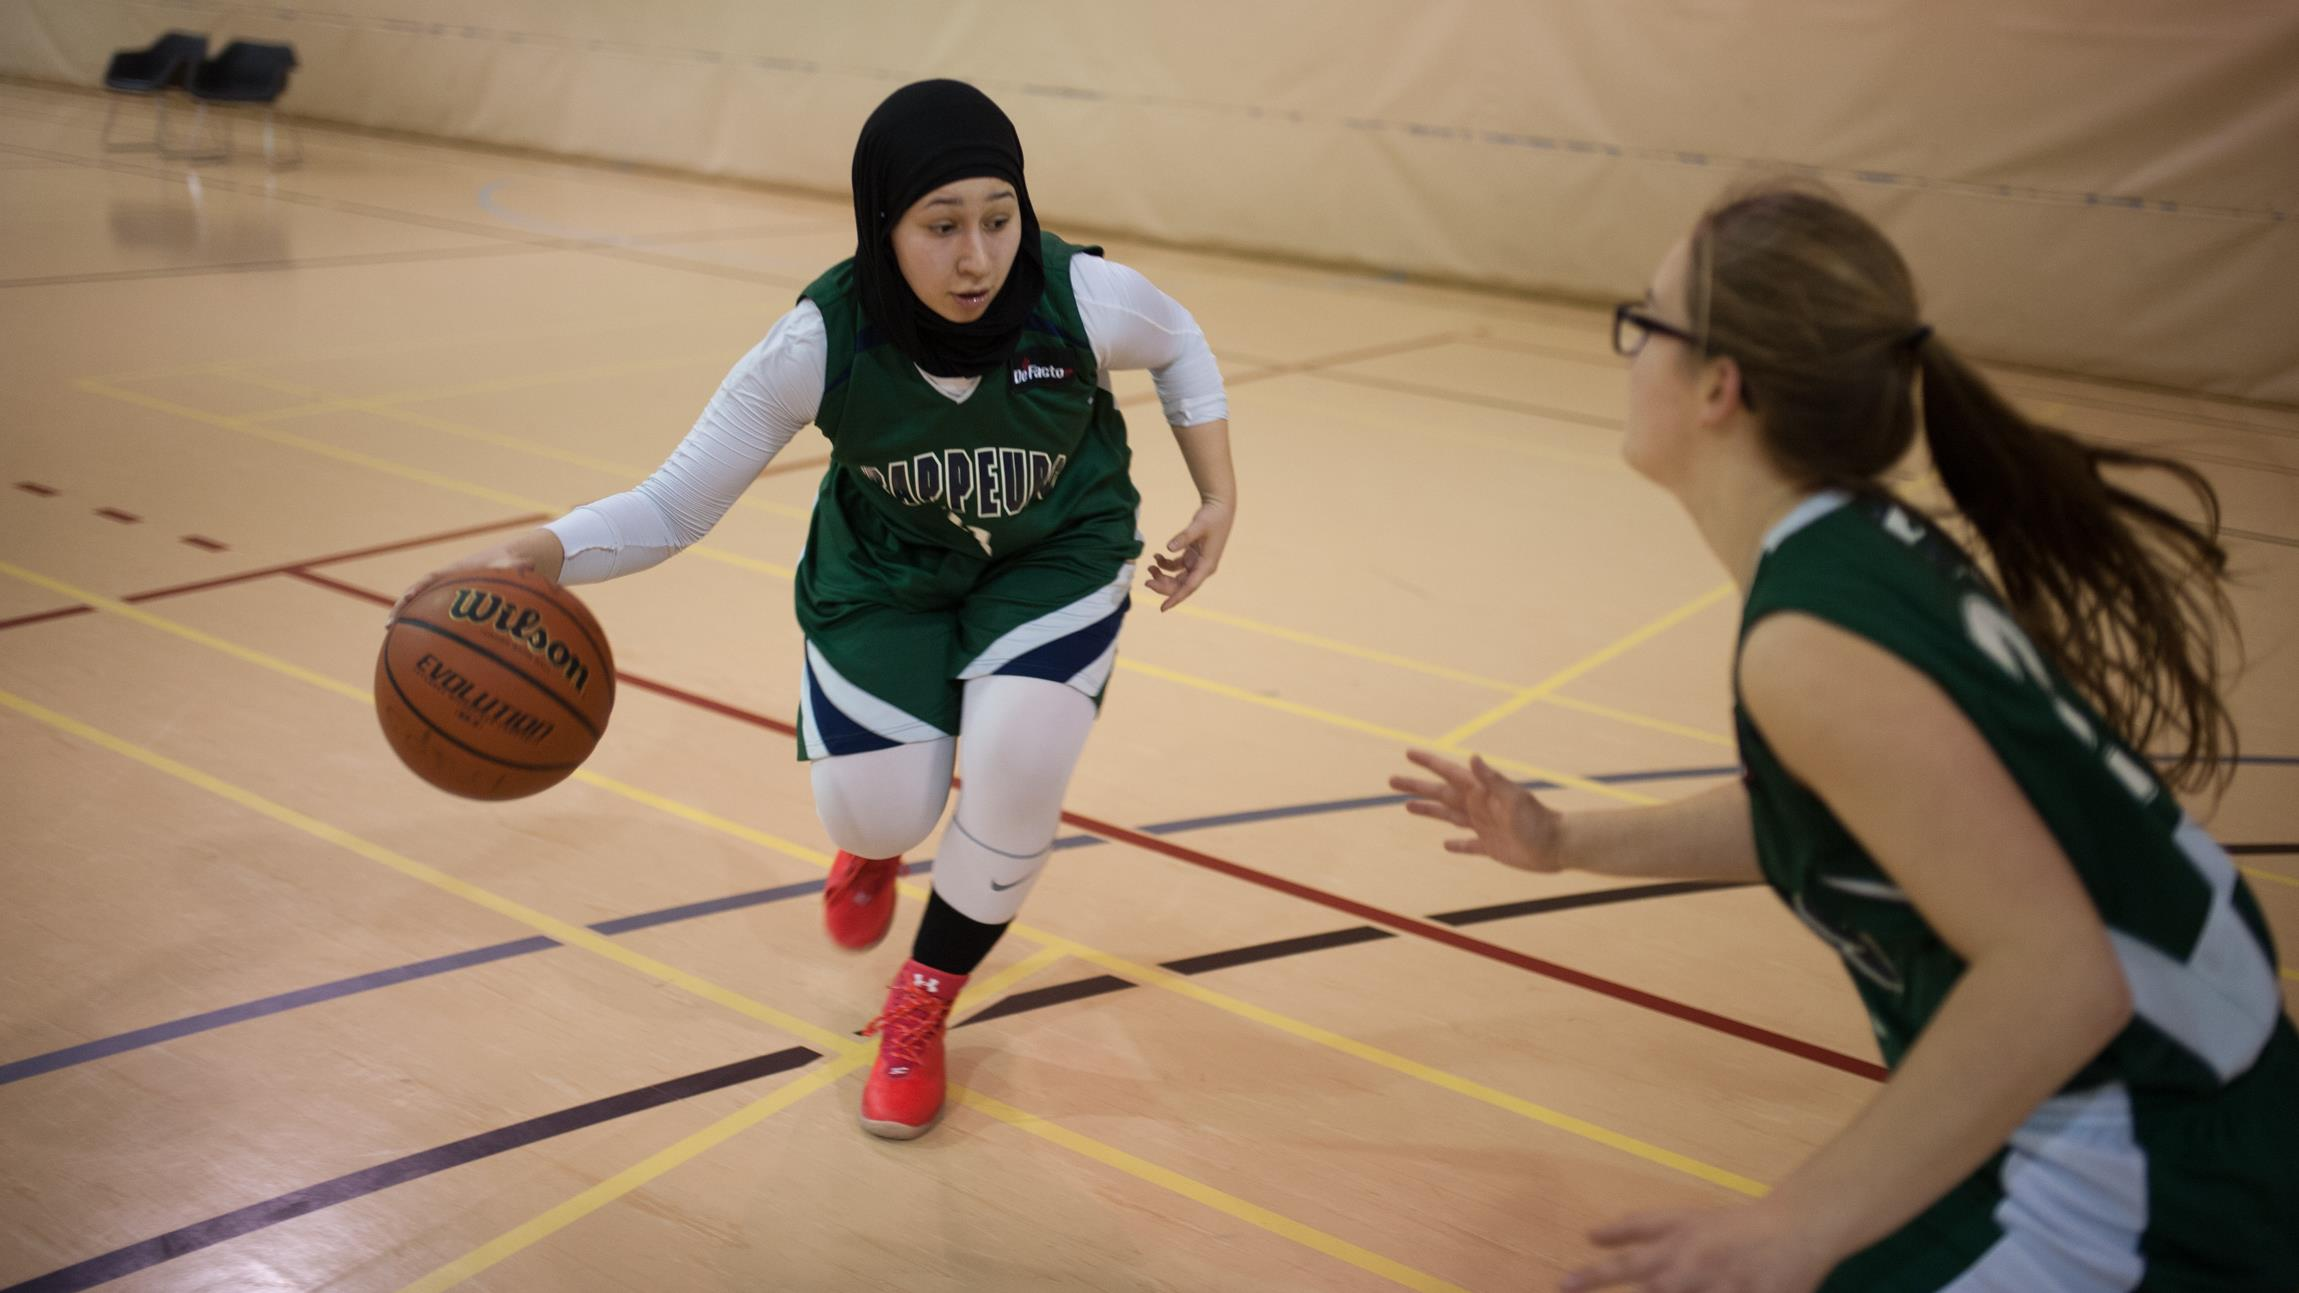 new product e63ea 943cd hijab-sport-nike-khadijah-jaffal-basketball-voile-3.jpg